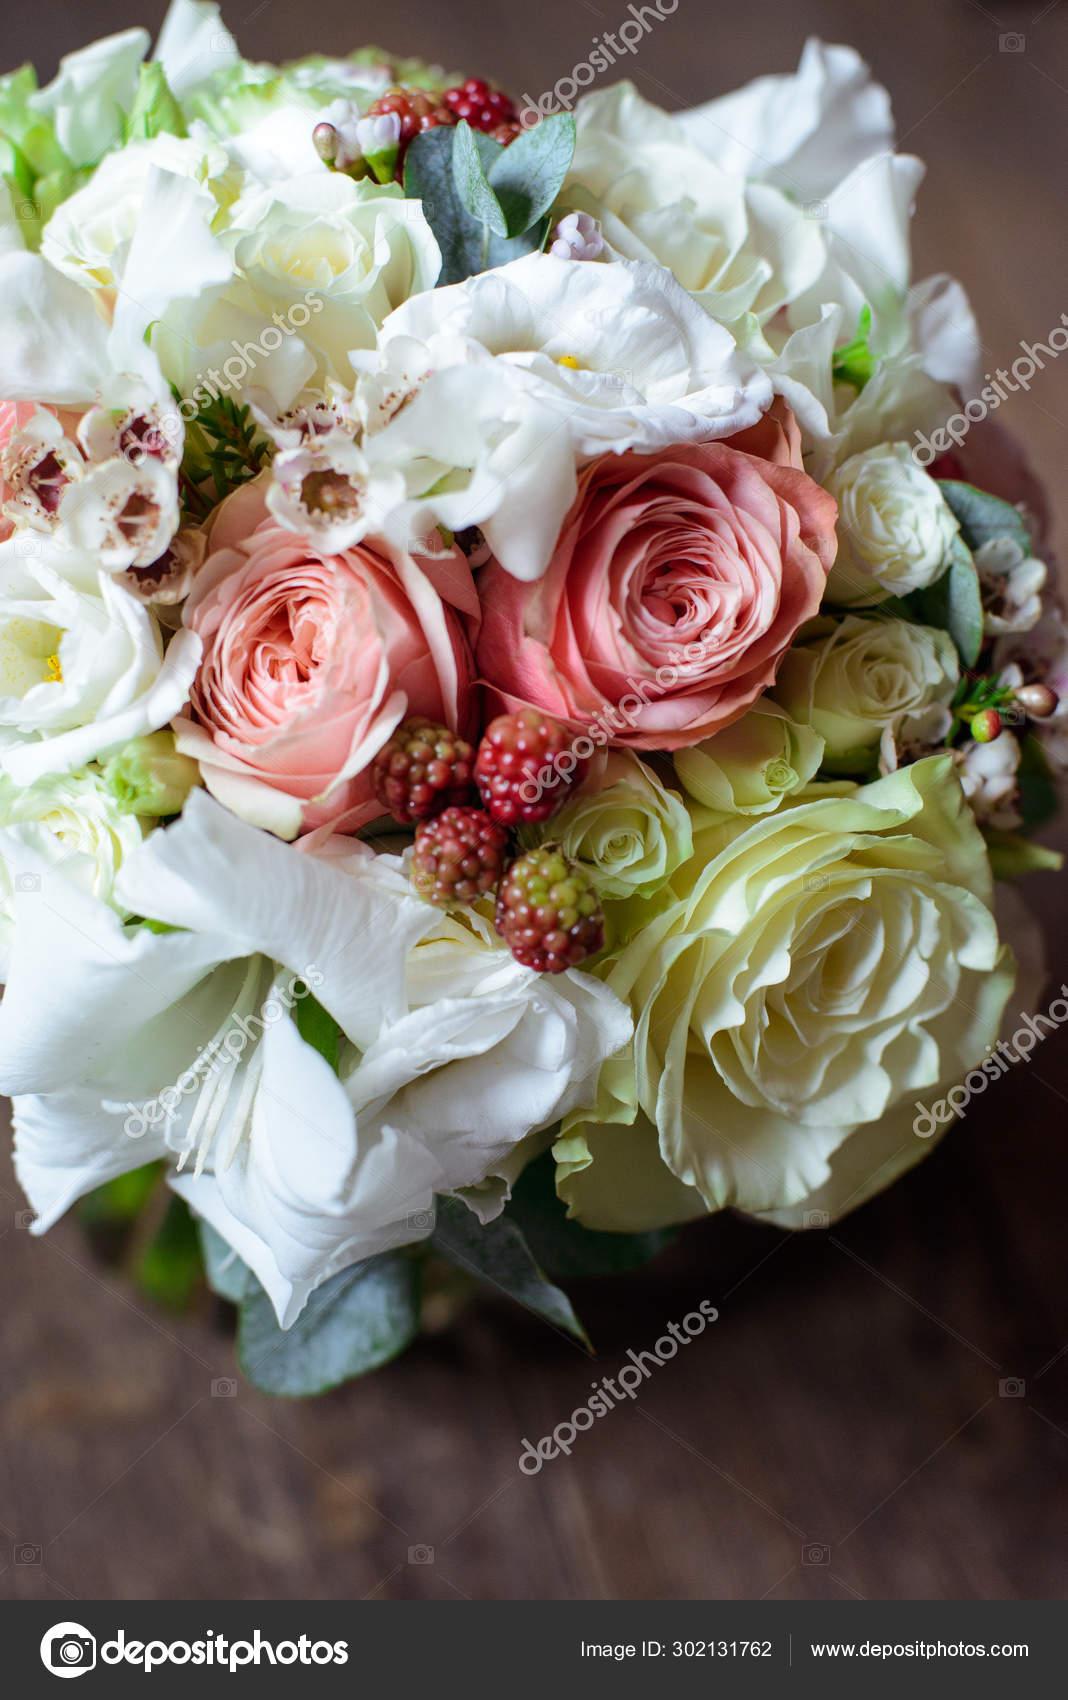 Most Beautiful Bouquet Flowers Anemone Rose Ranunculus Mattiola Tulip Eucalyptus Stock Photo C Plan905 302131762